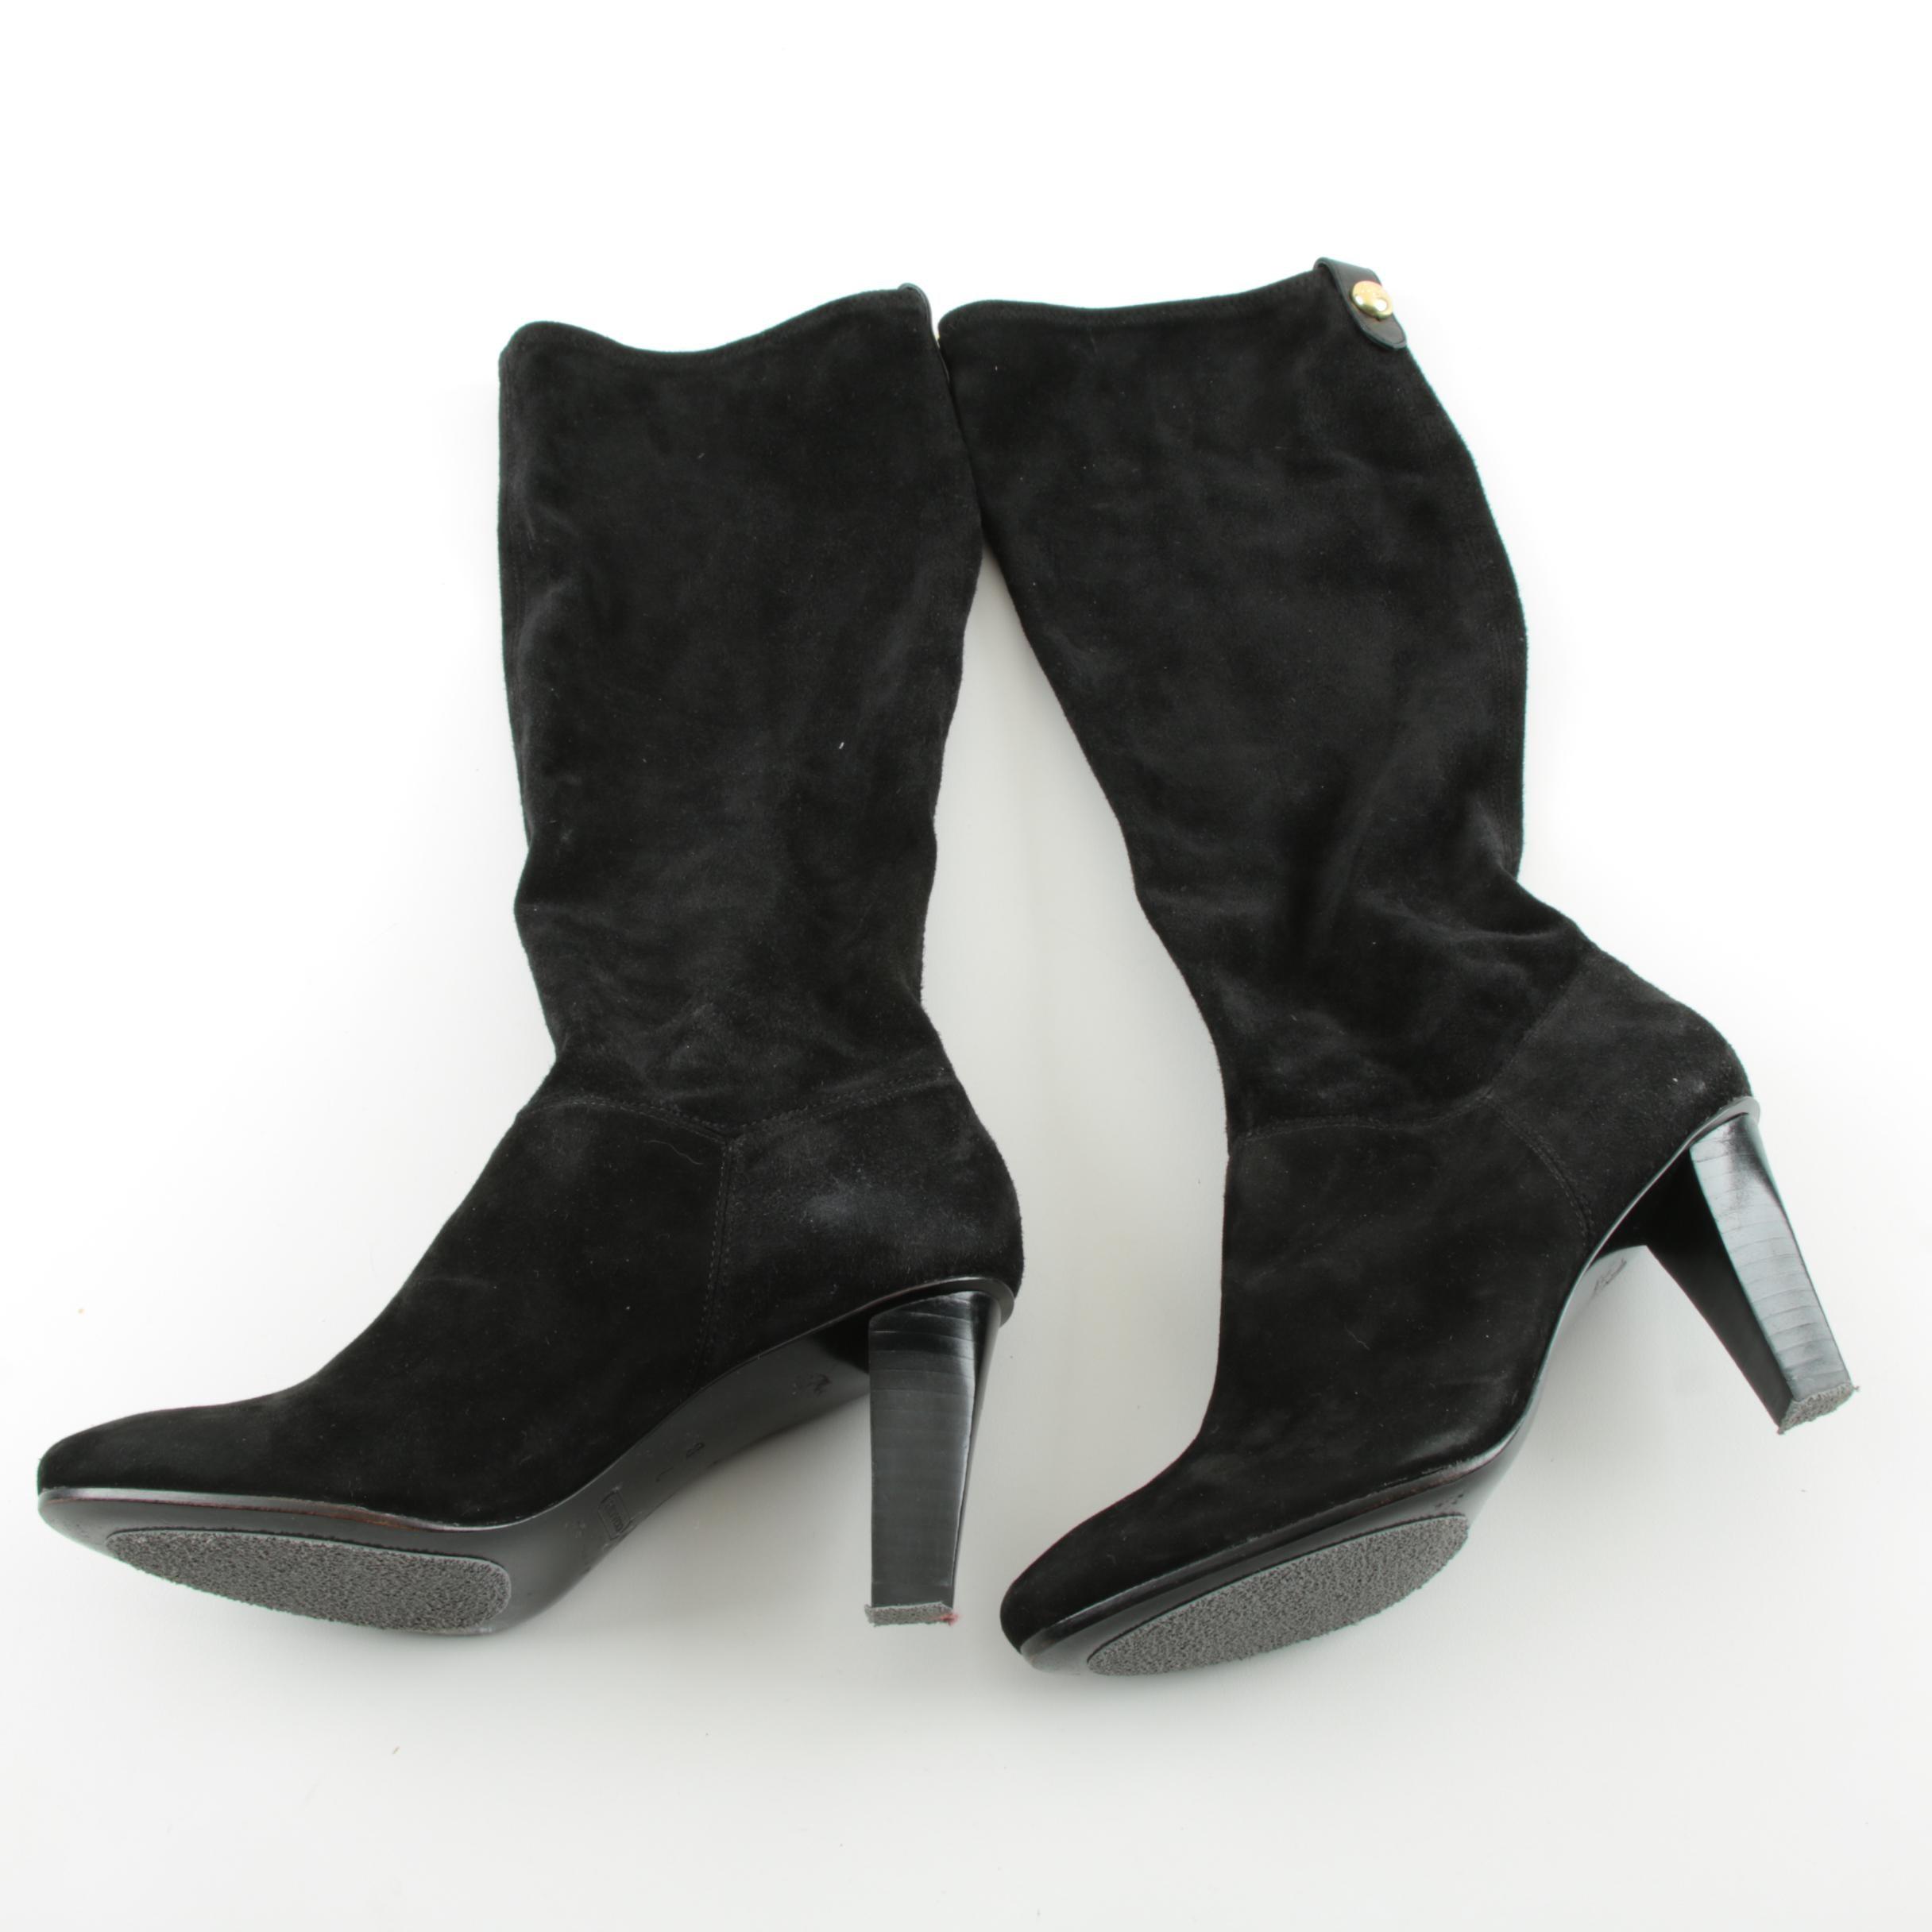 Coach Black Suede High Heel Boots